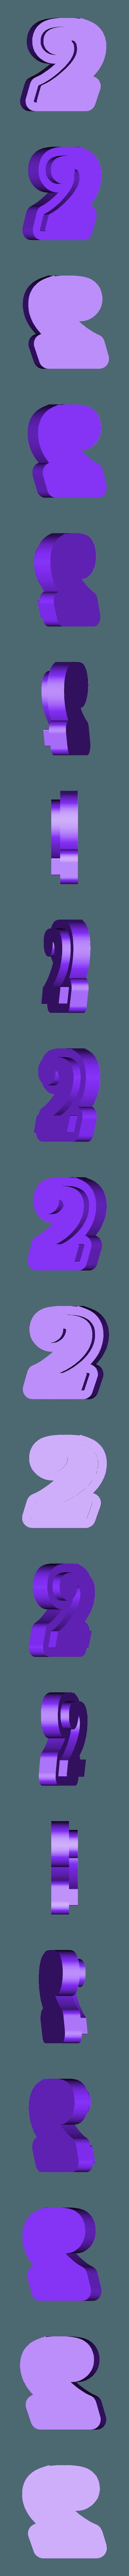 Wall Clock_2.stl Download free STL file Numbers for Bird wall clock • 3D printable design, MAyobe